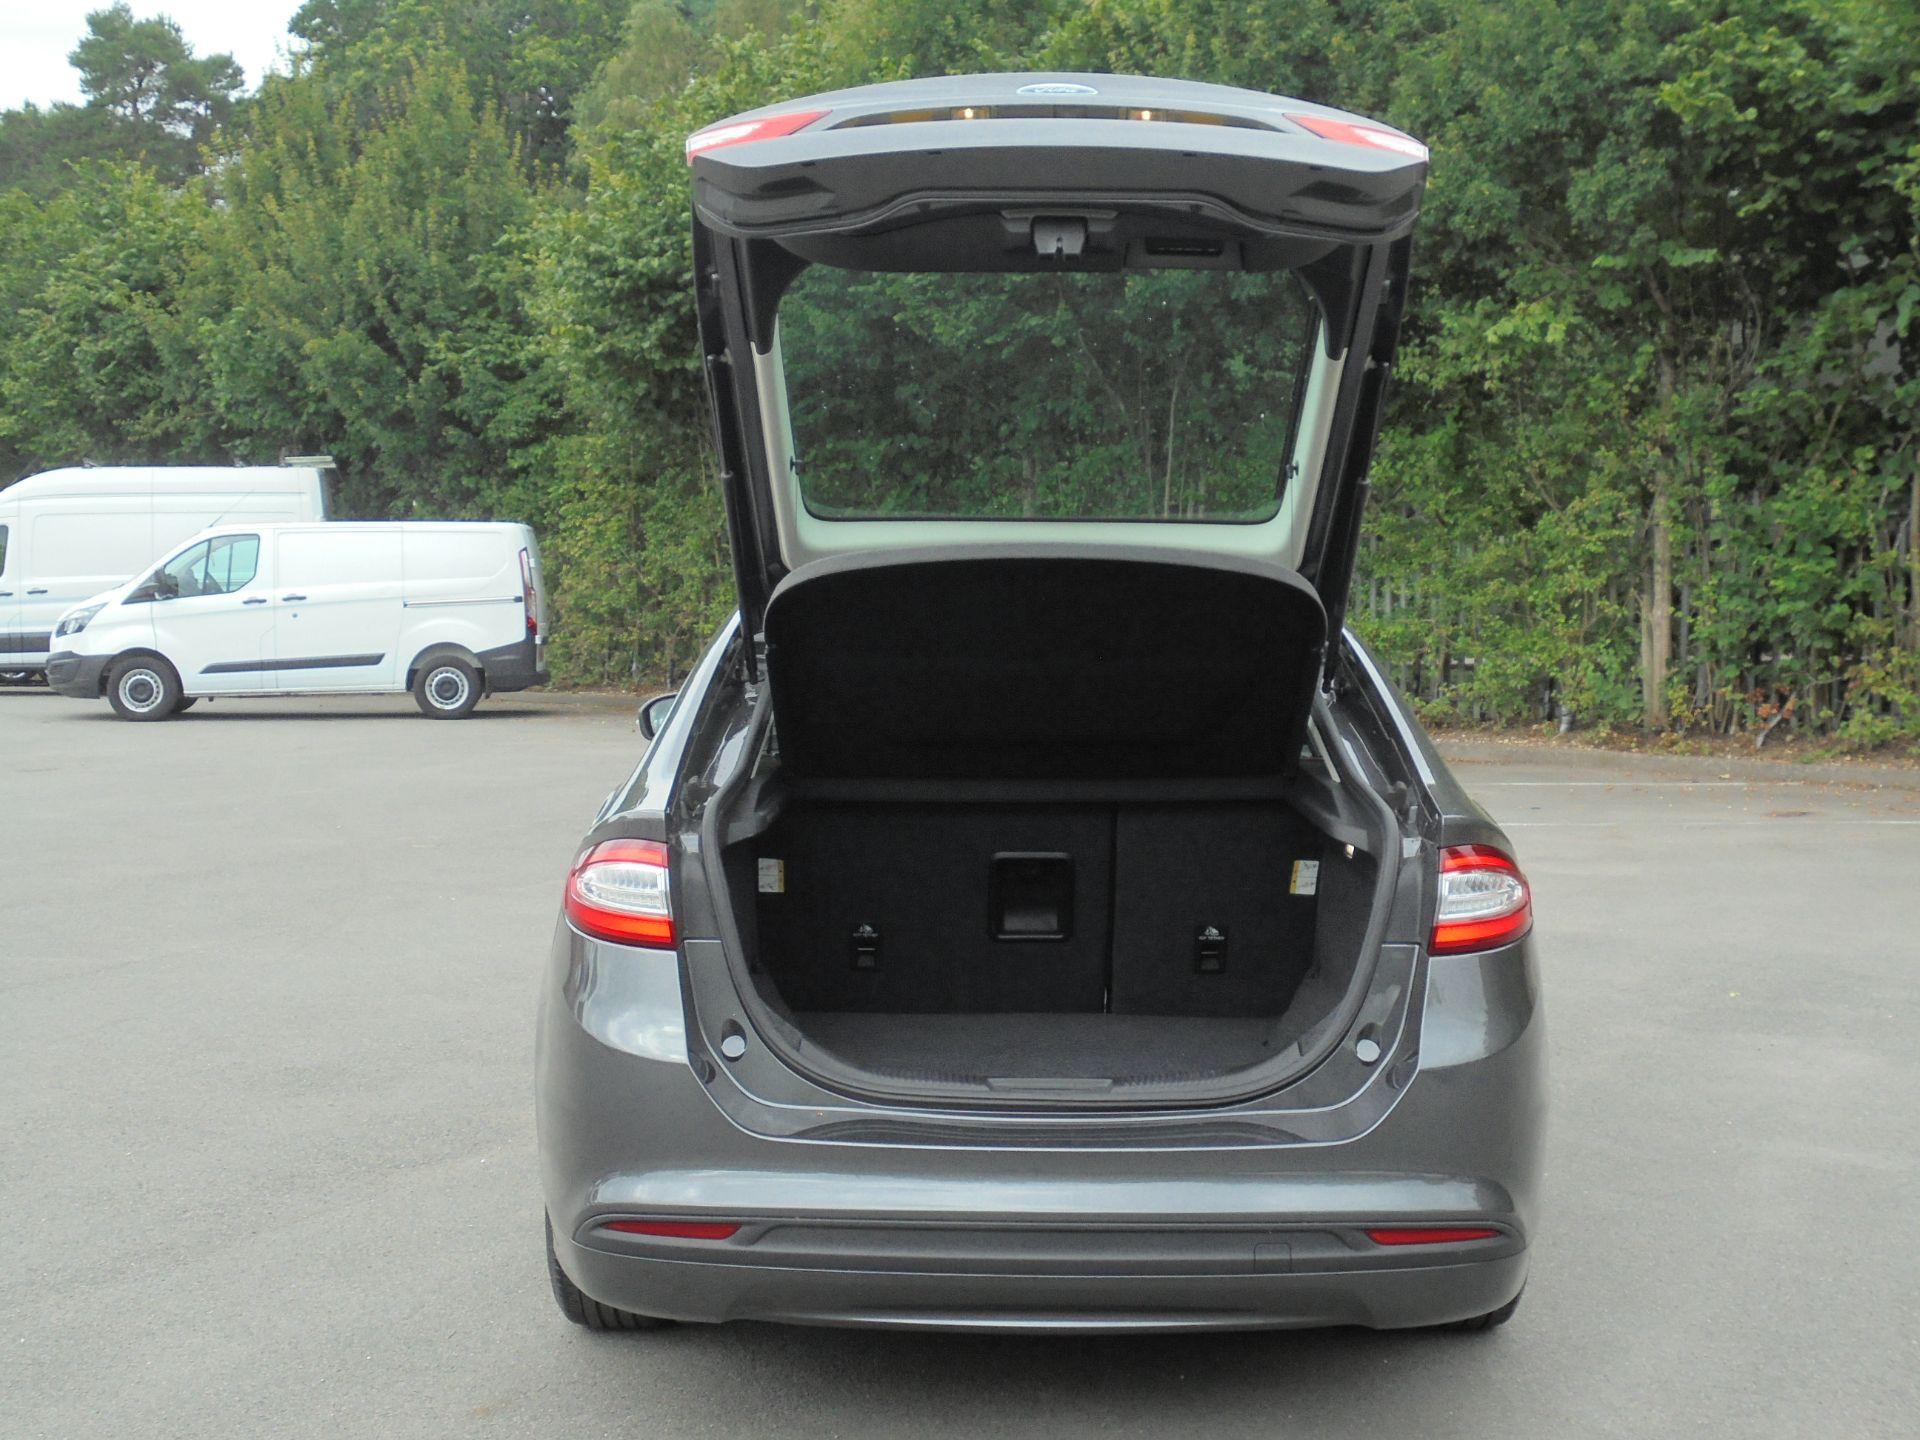 2017 Ford Mondeo 2.0 Tdci Econetic Zetec 5Dr [Nav] (WM17RHO) Image 8